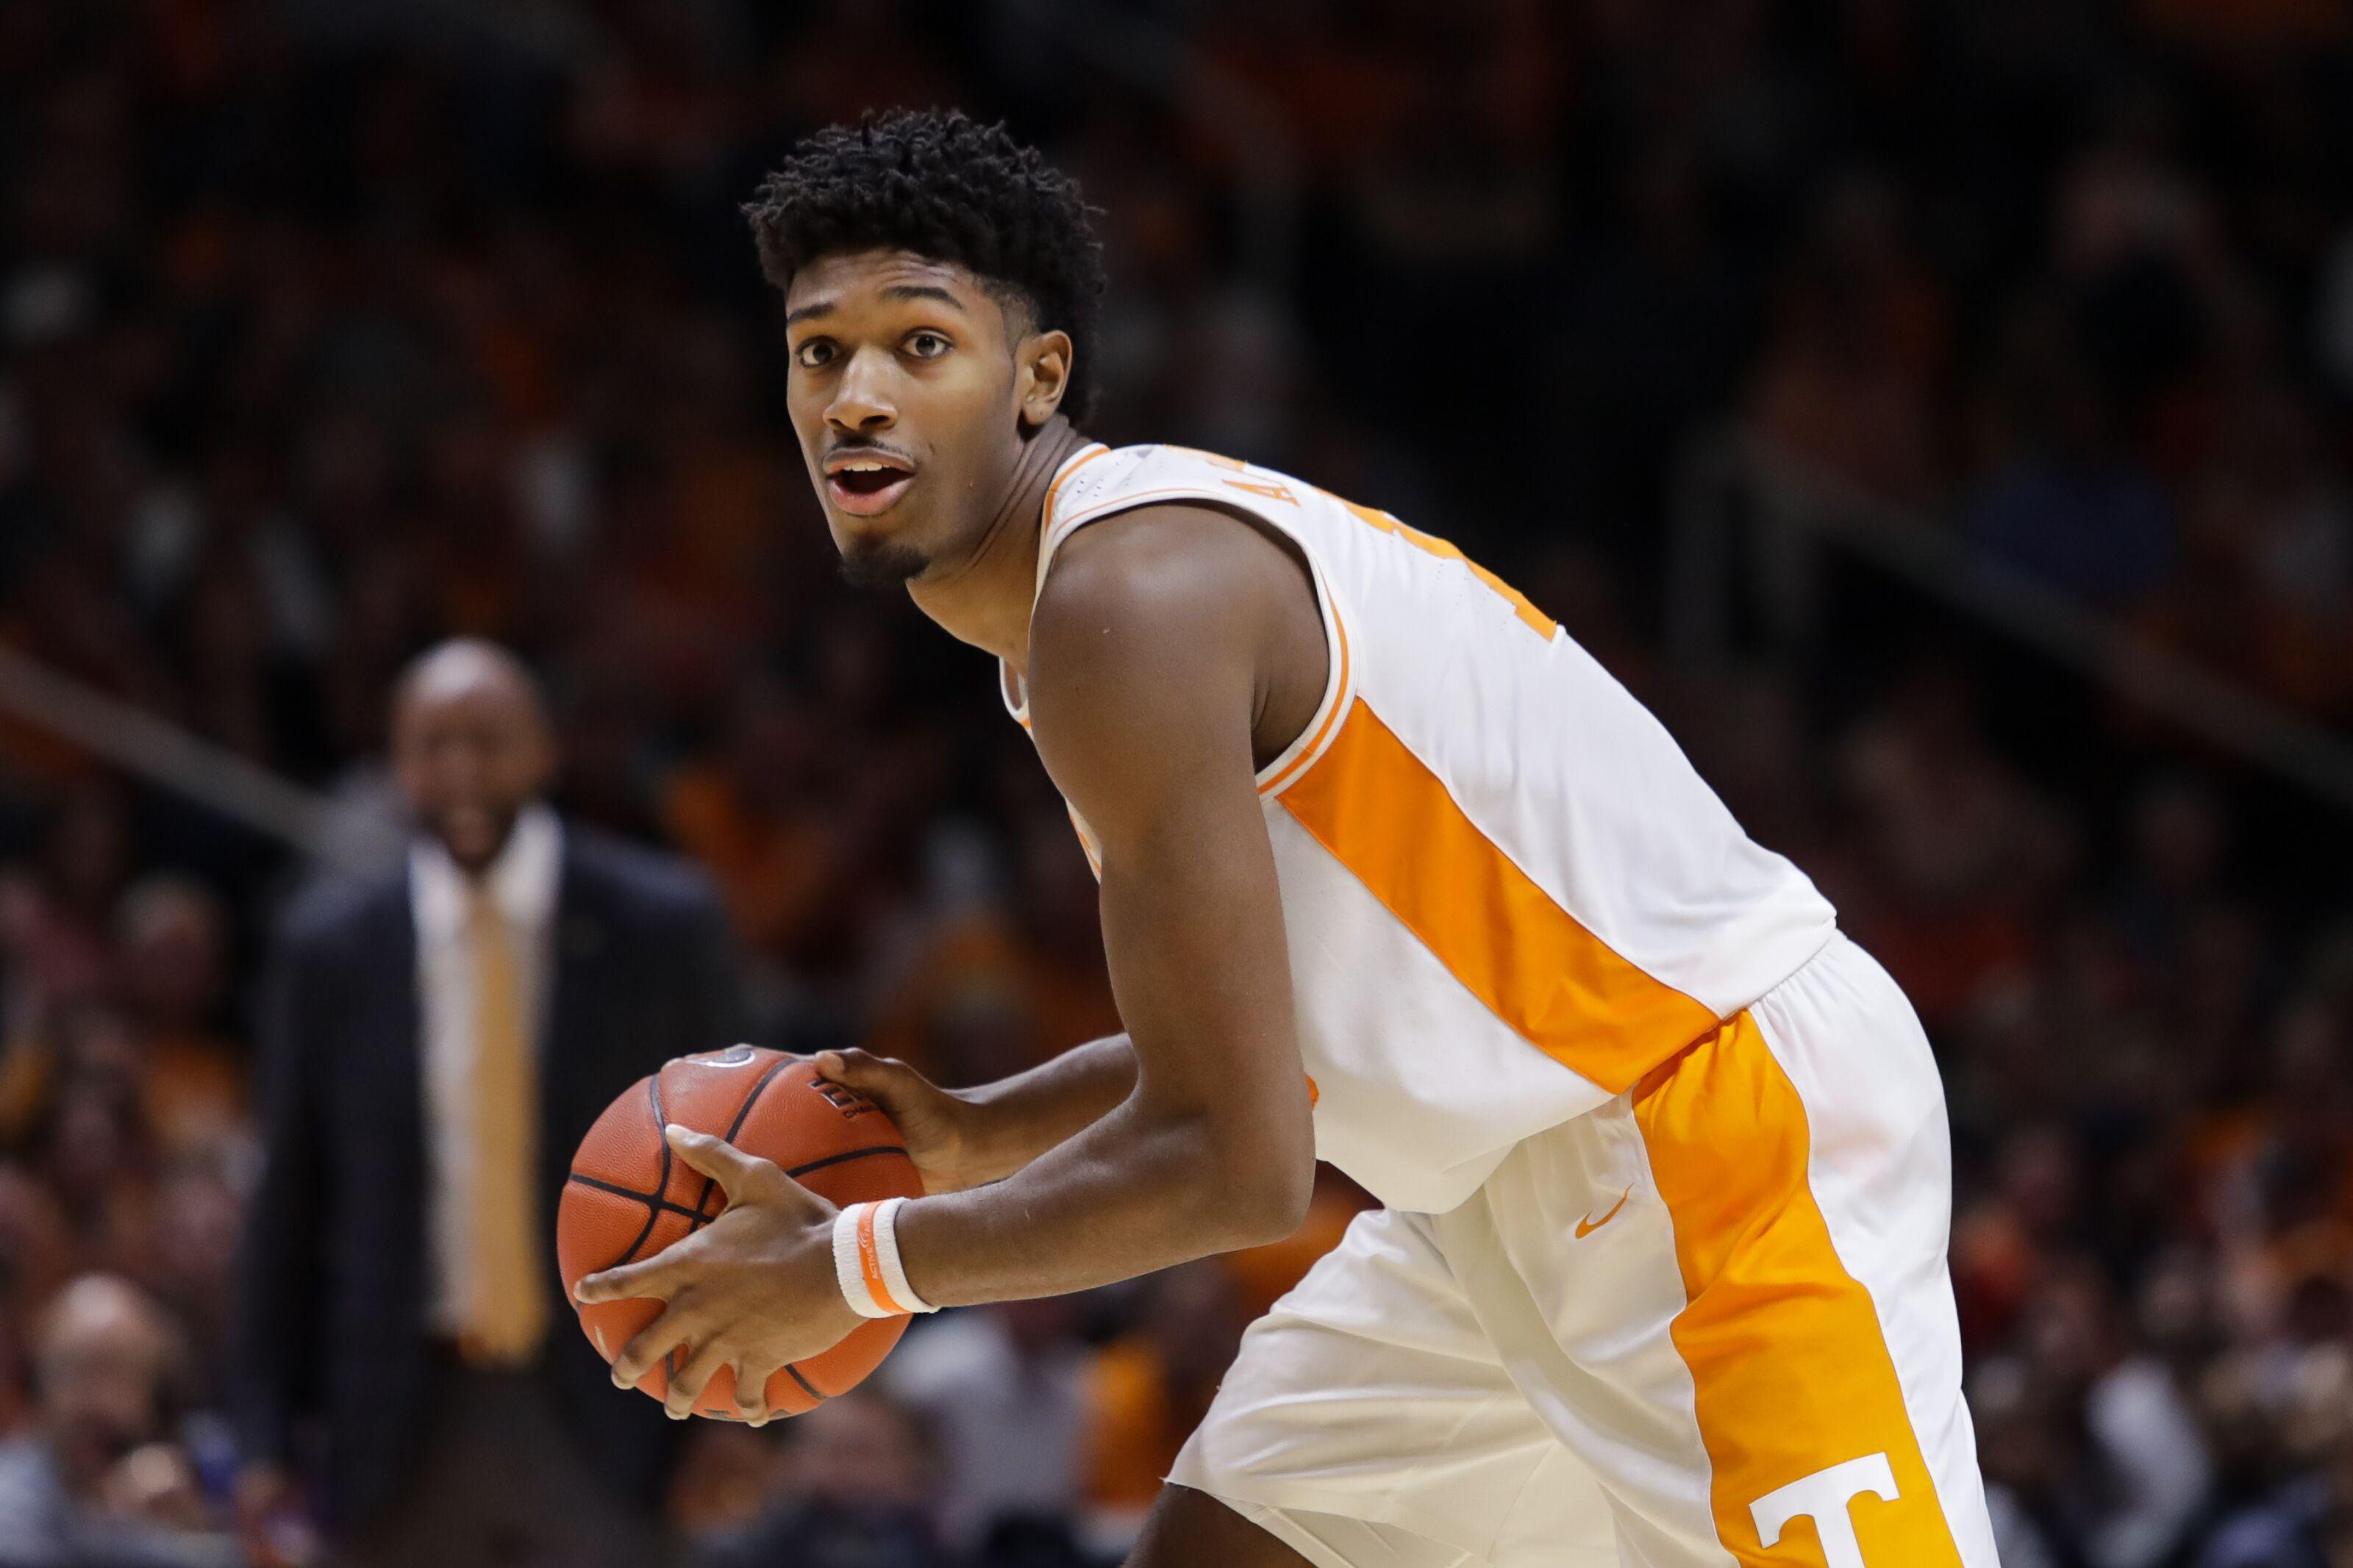 Uk Basketball: Tennessee Basketball: 2018-19 Keys For The Vols Against